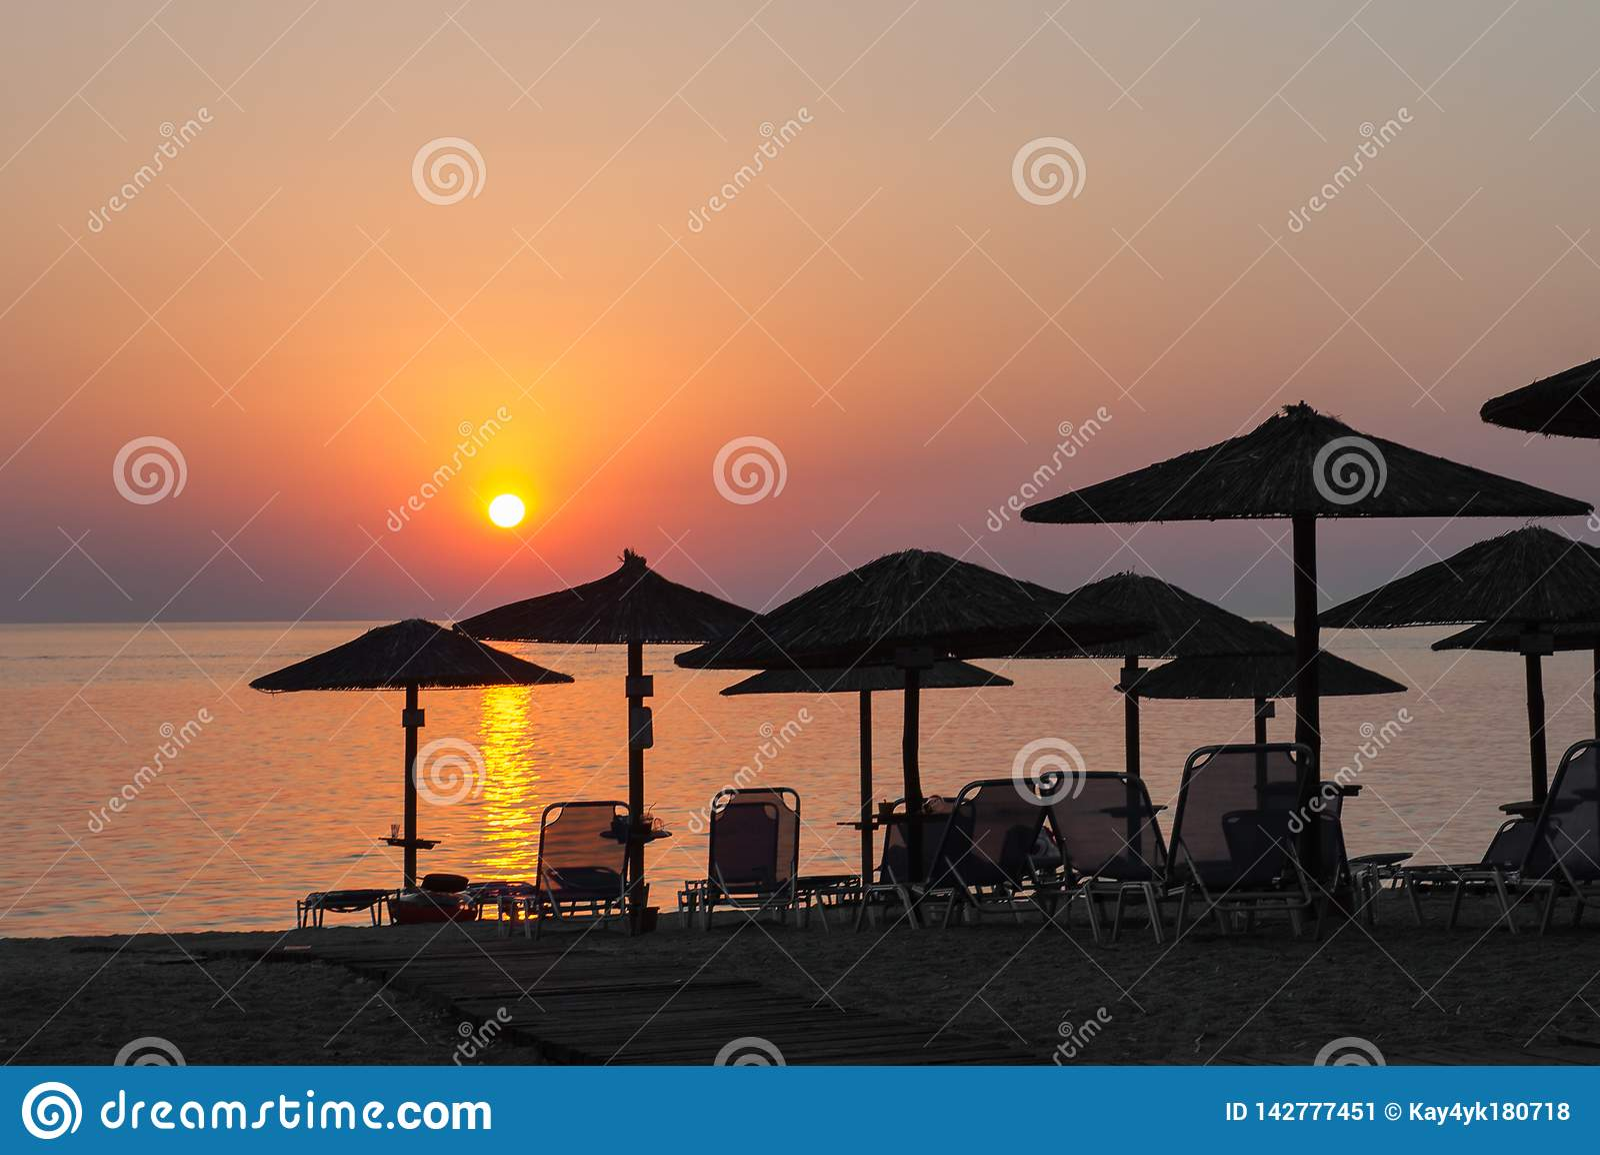 Beach umbrellas at sunset, with sunbeds, hot sunset on the beach